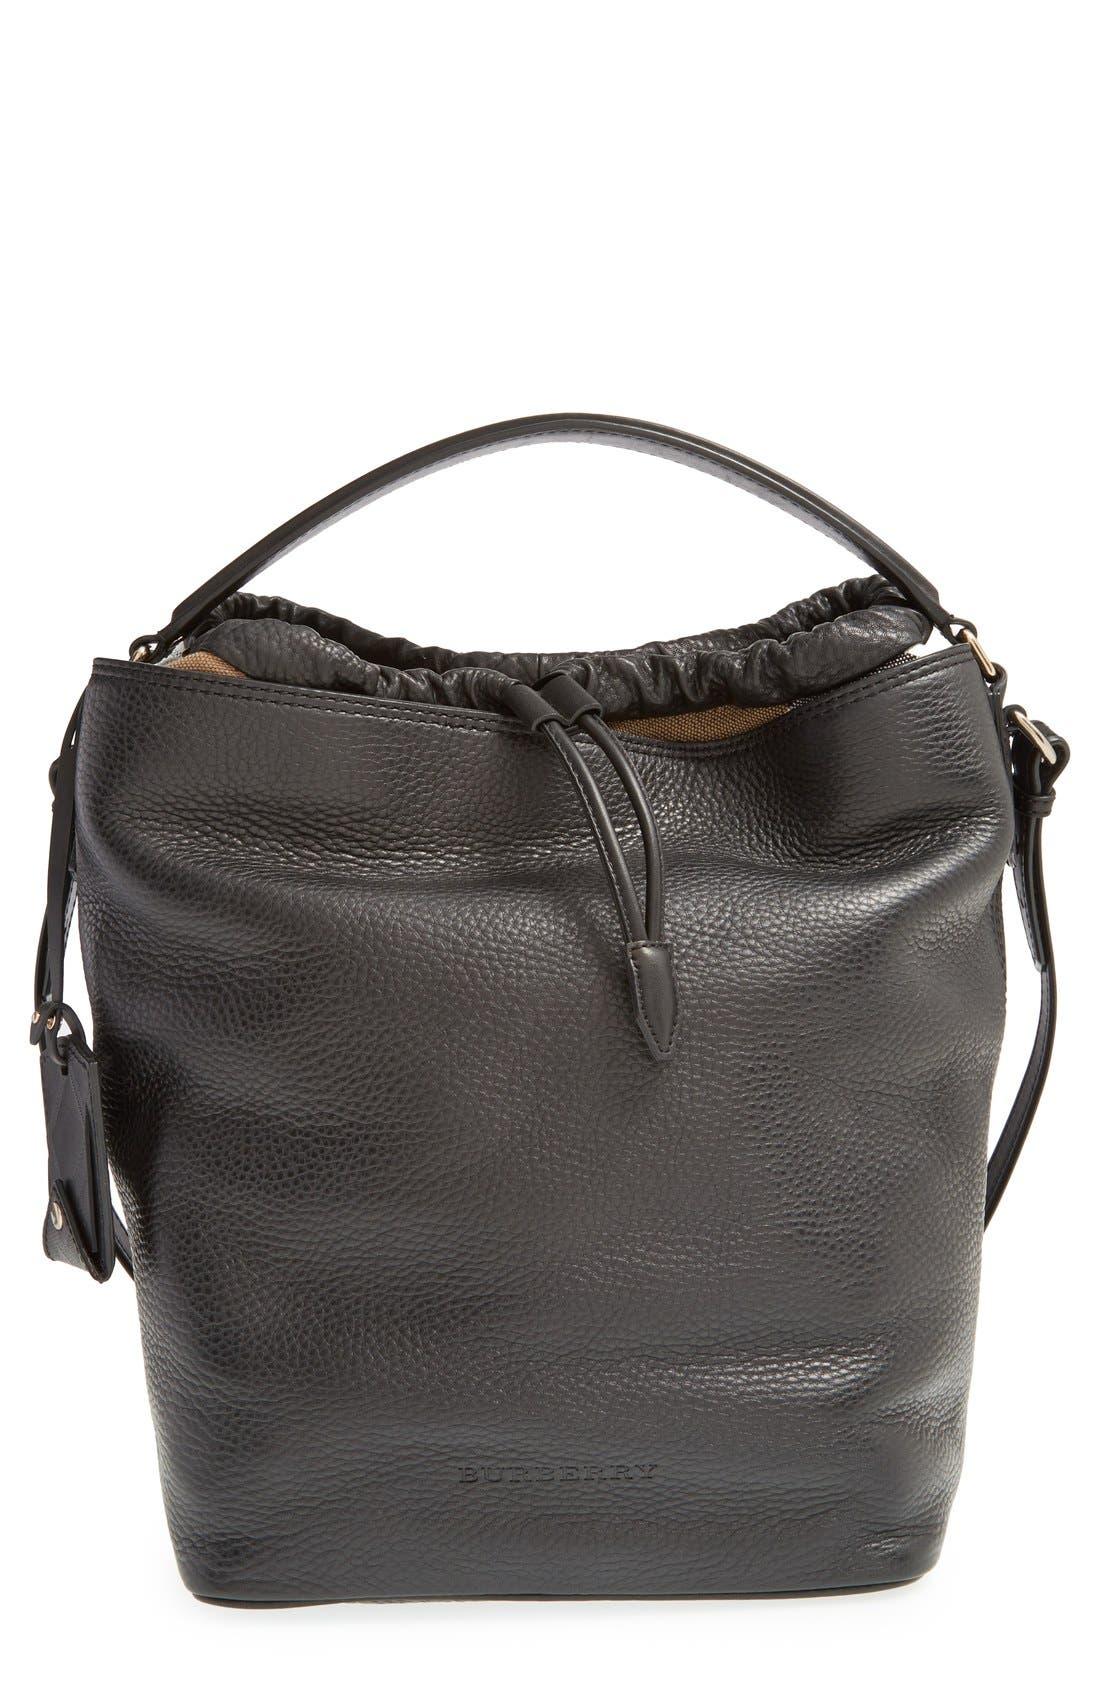 Brit 'Medium Susanna' Leather & Canvas Check Hobo Bag,                             Main thumbnail 1, color,                             001